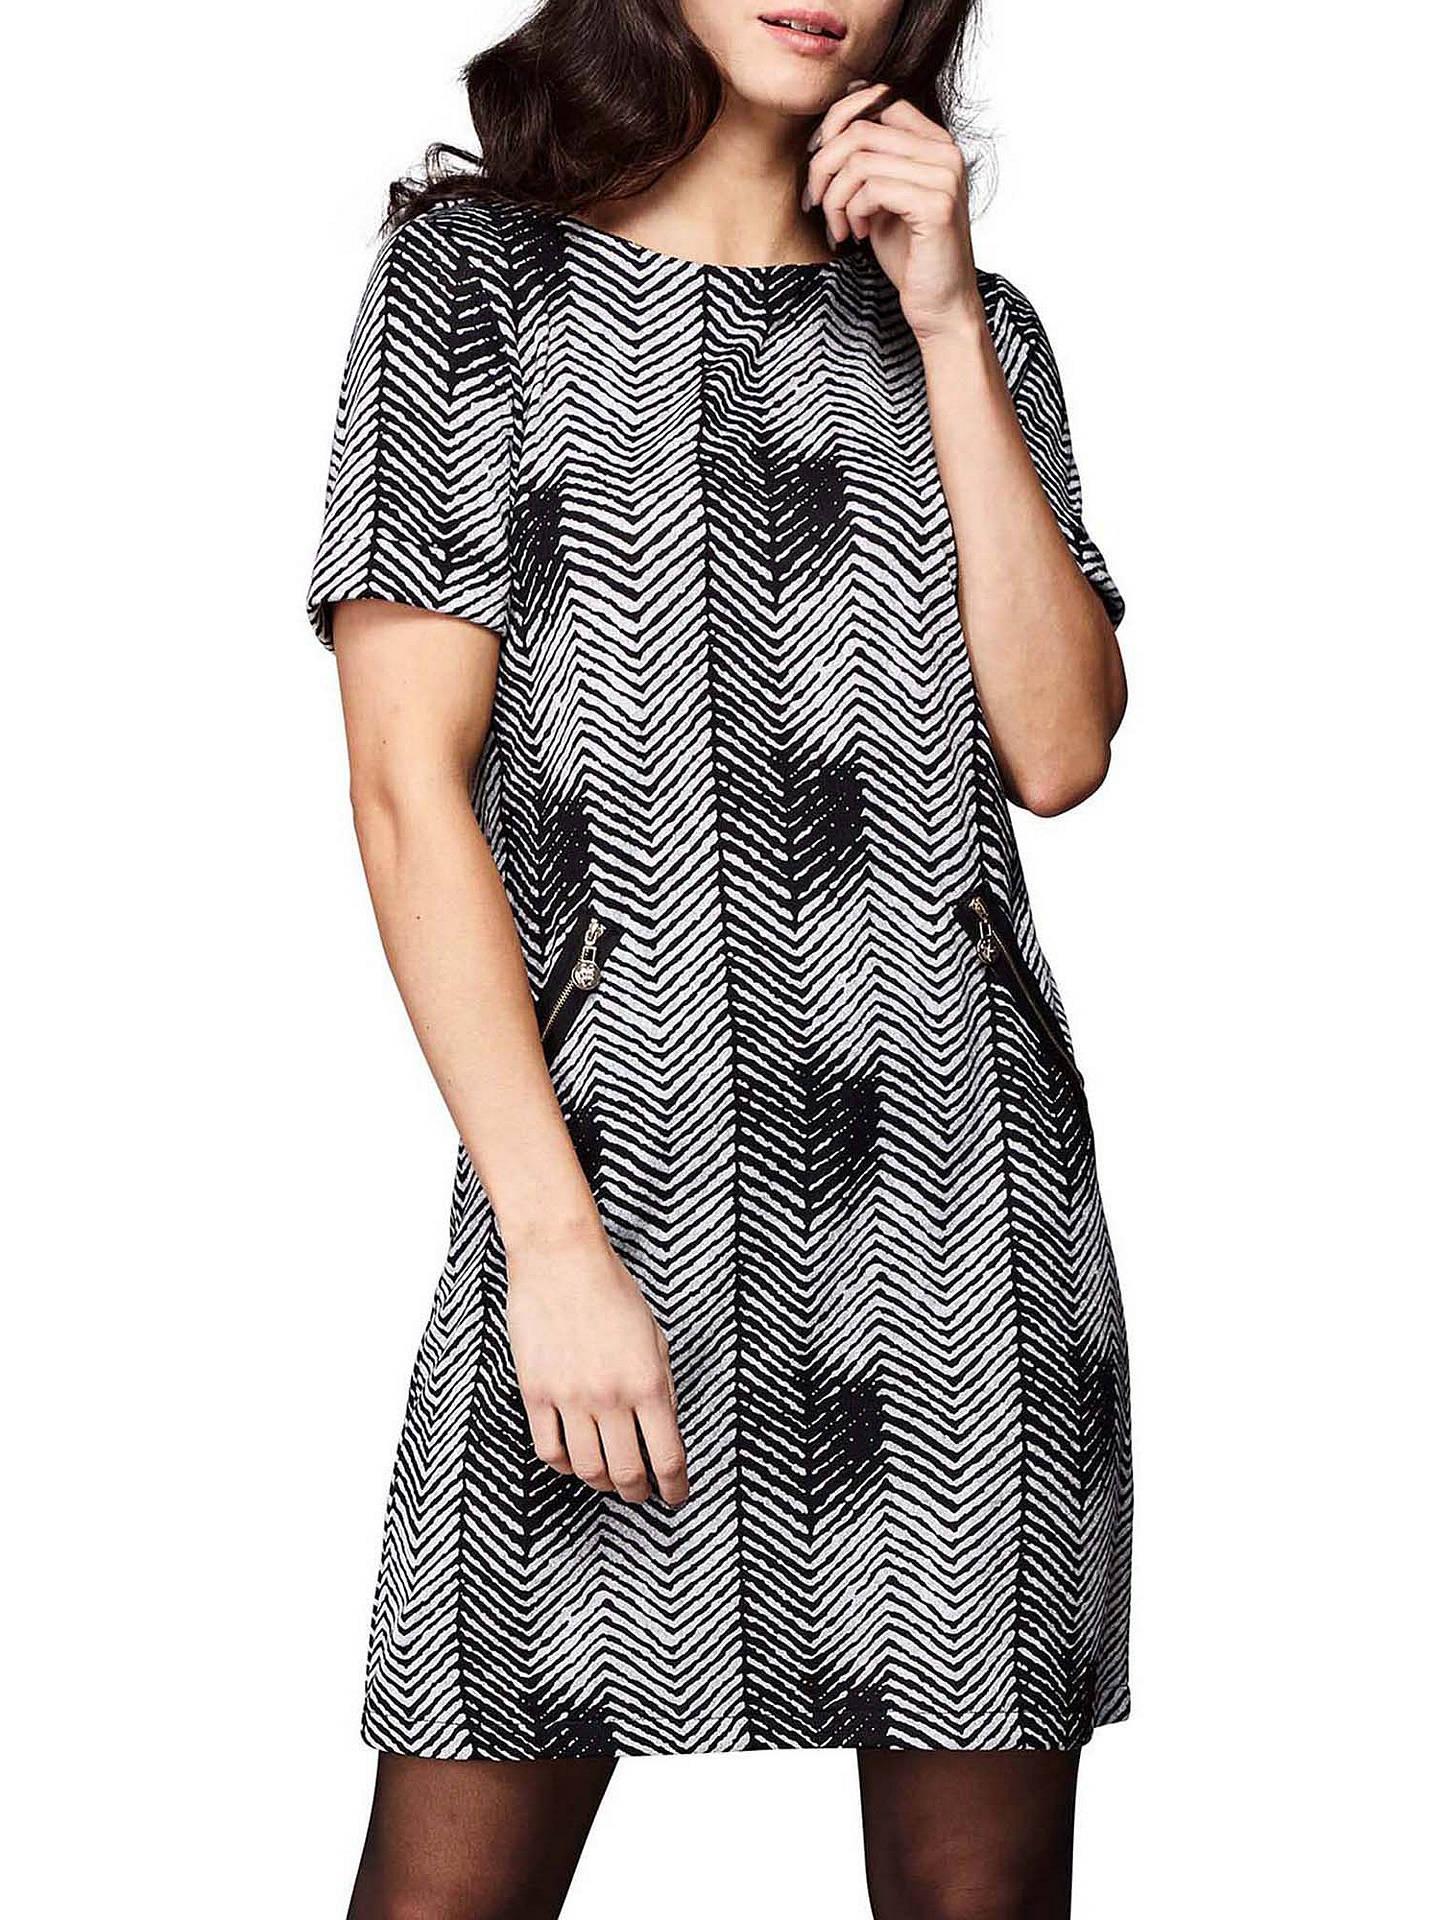 46d82be1a8aca Yumi Zig Zag Shift Dress, Black at John Lewis & Partners